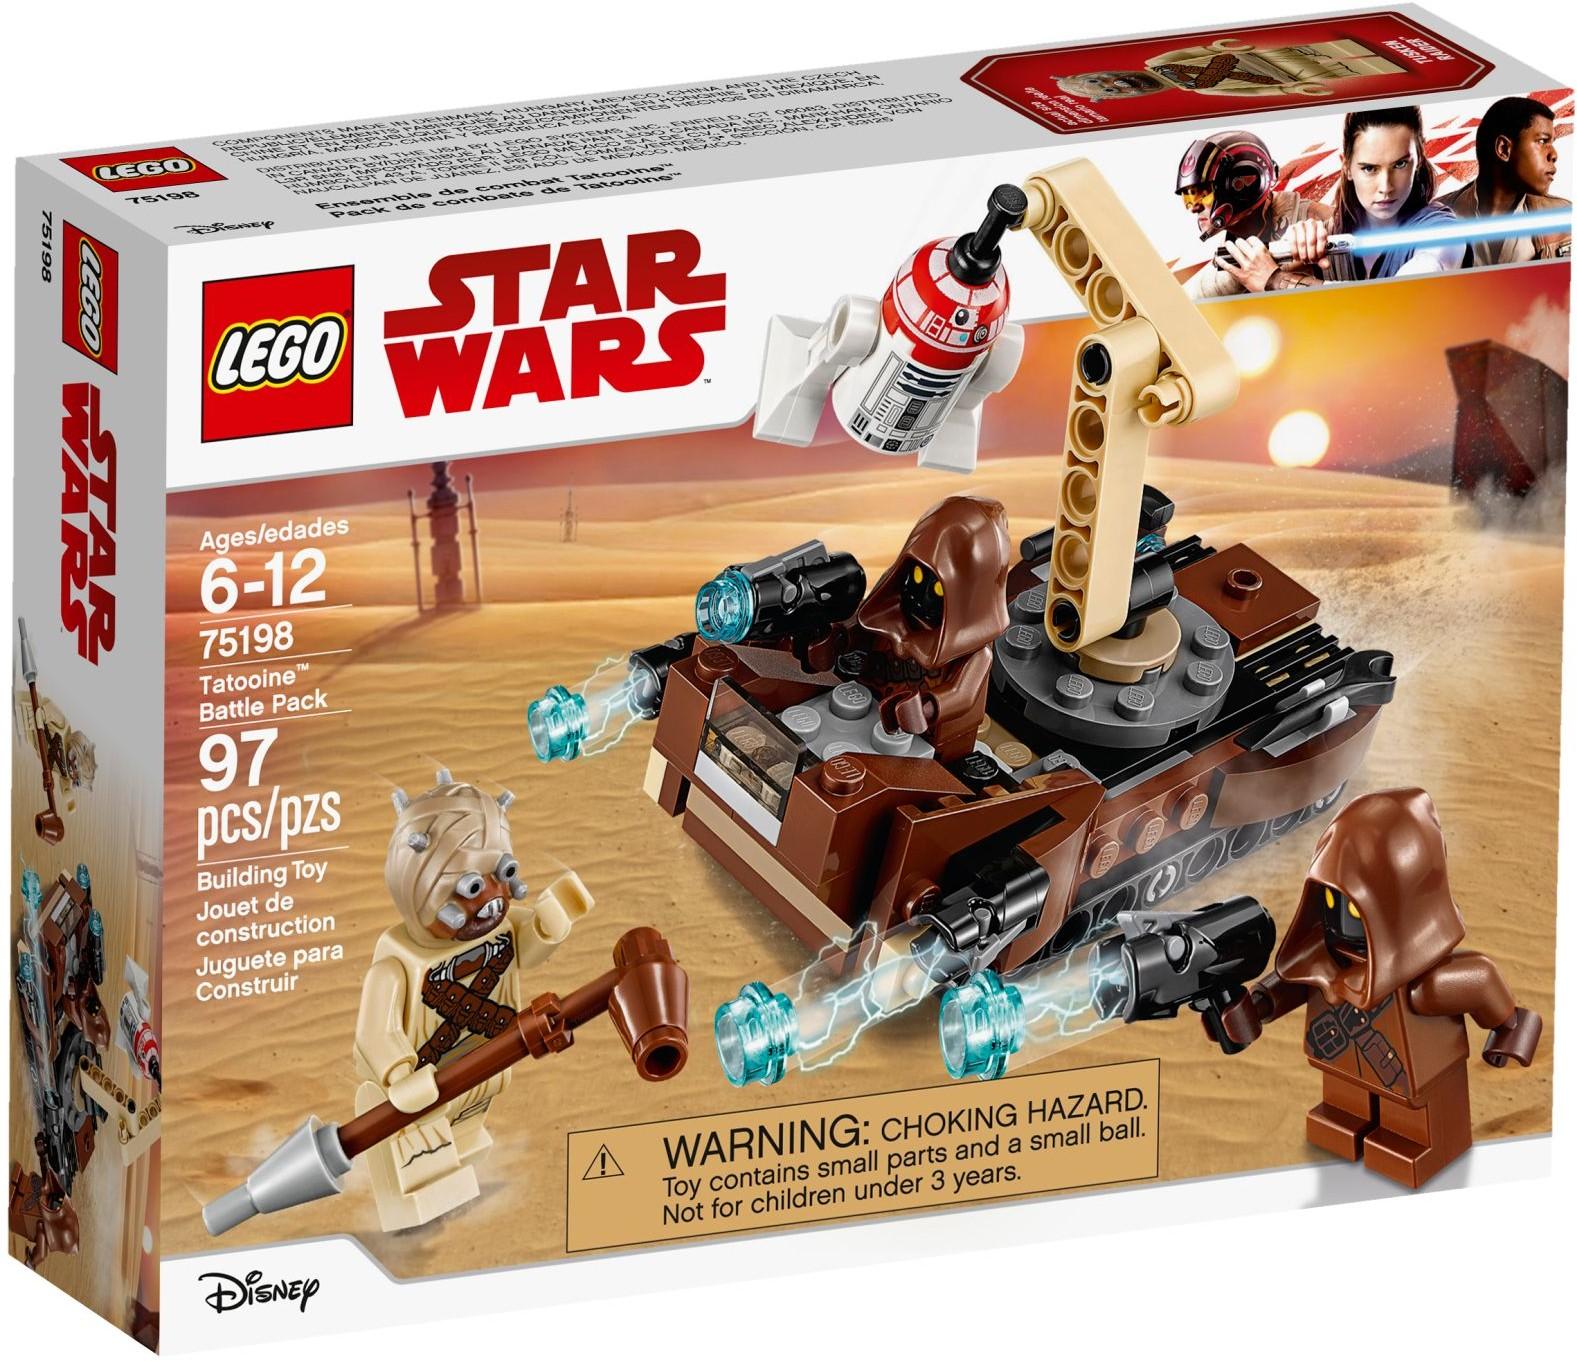 Lego Star Wars Episode A New Hope Tatooine Battle Pack 75198 Building Kit